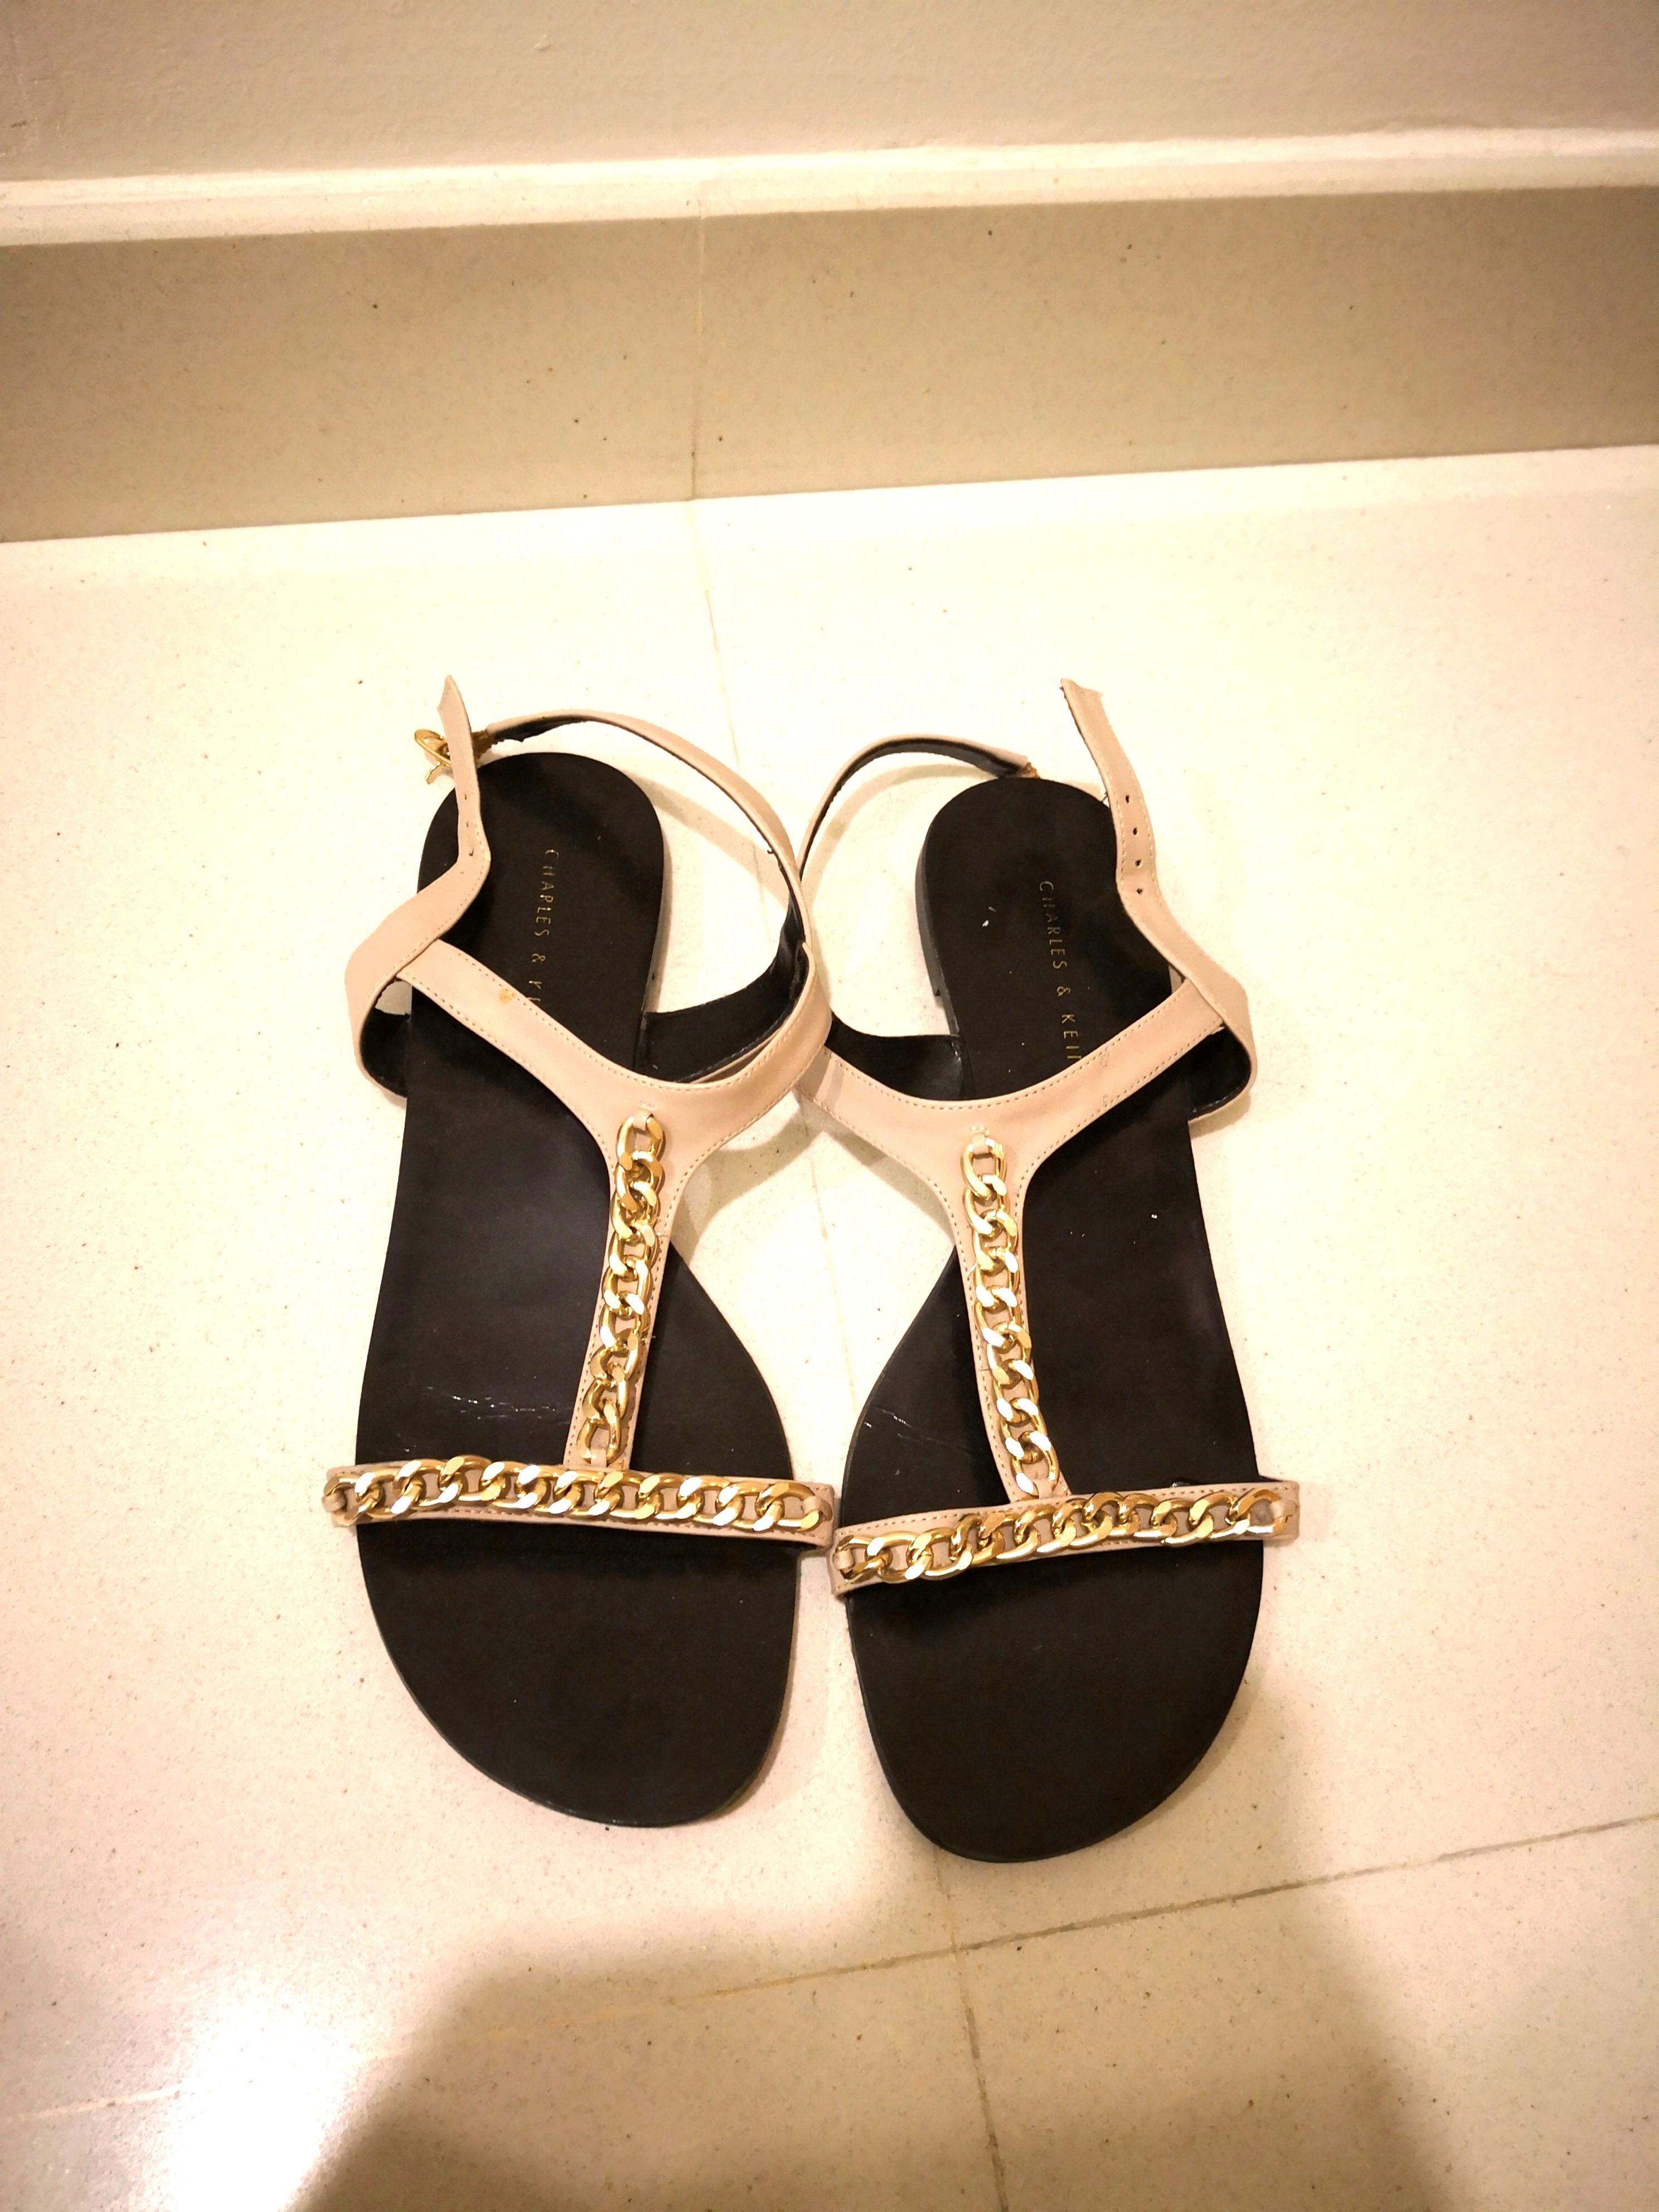 5f65ee4e6a8286 Home · Women s Fashion · Shoes · Flats   Sandals. photo photo ...